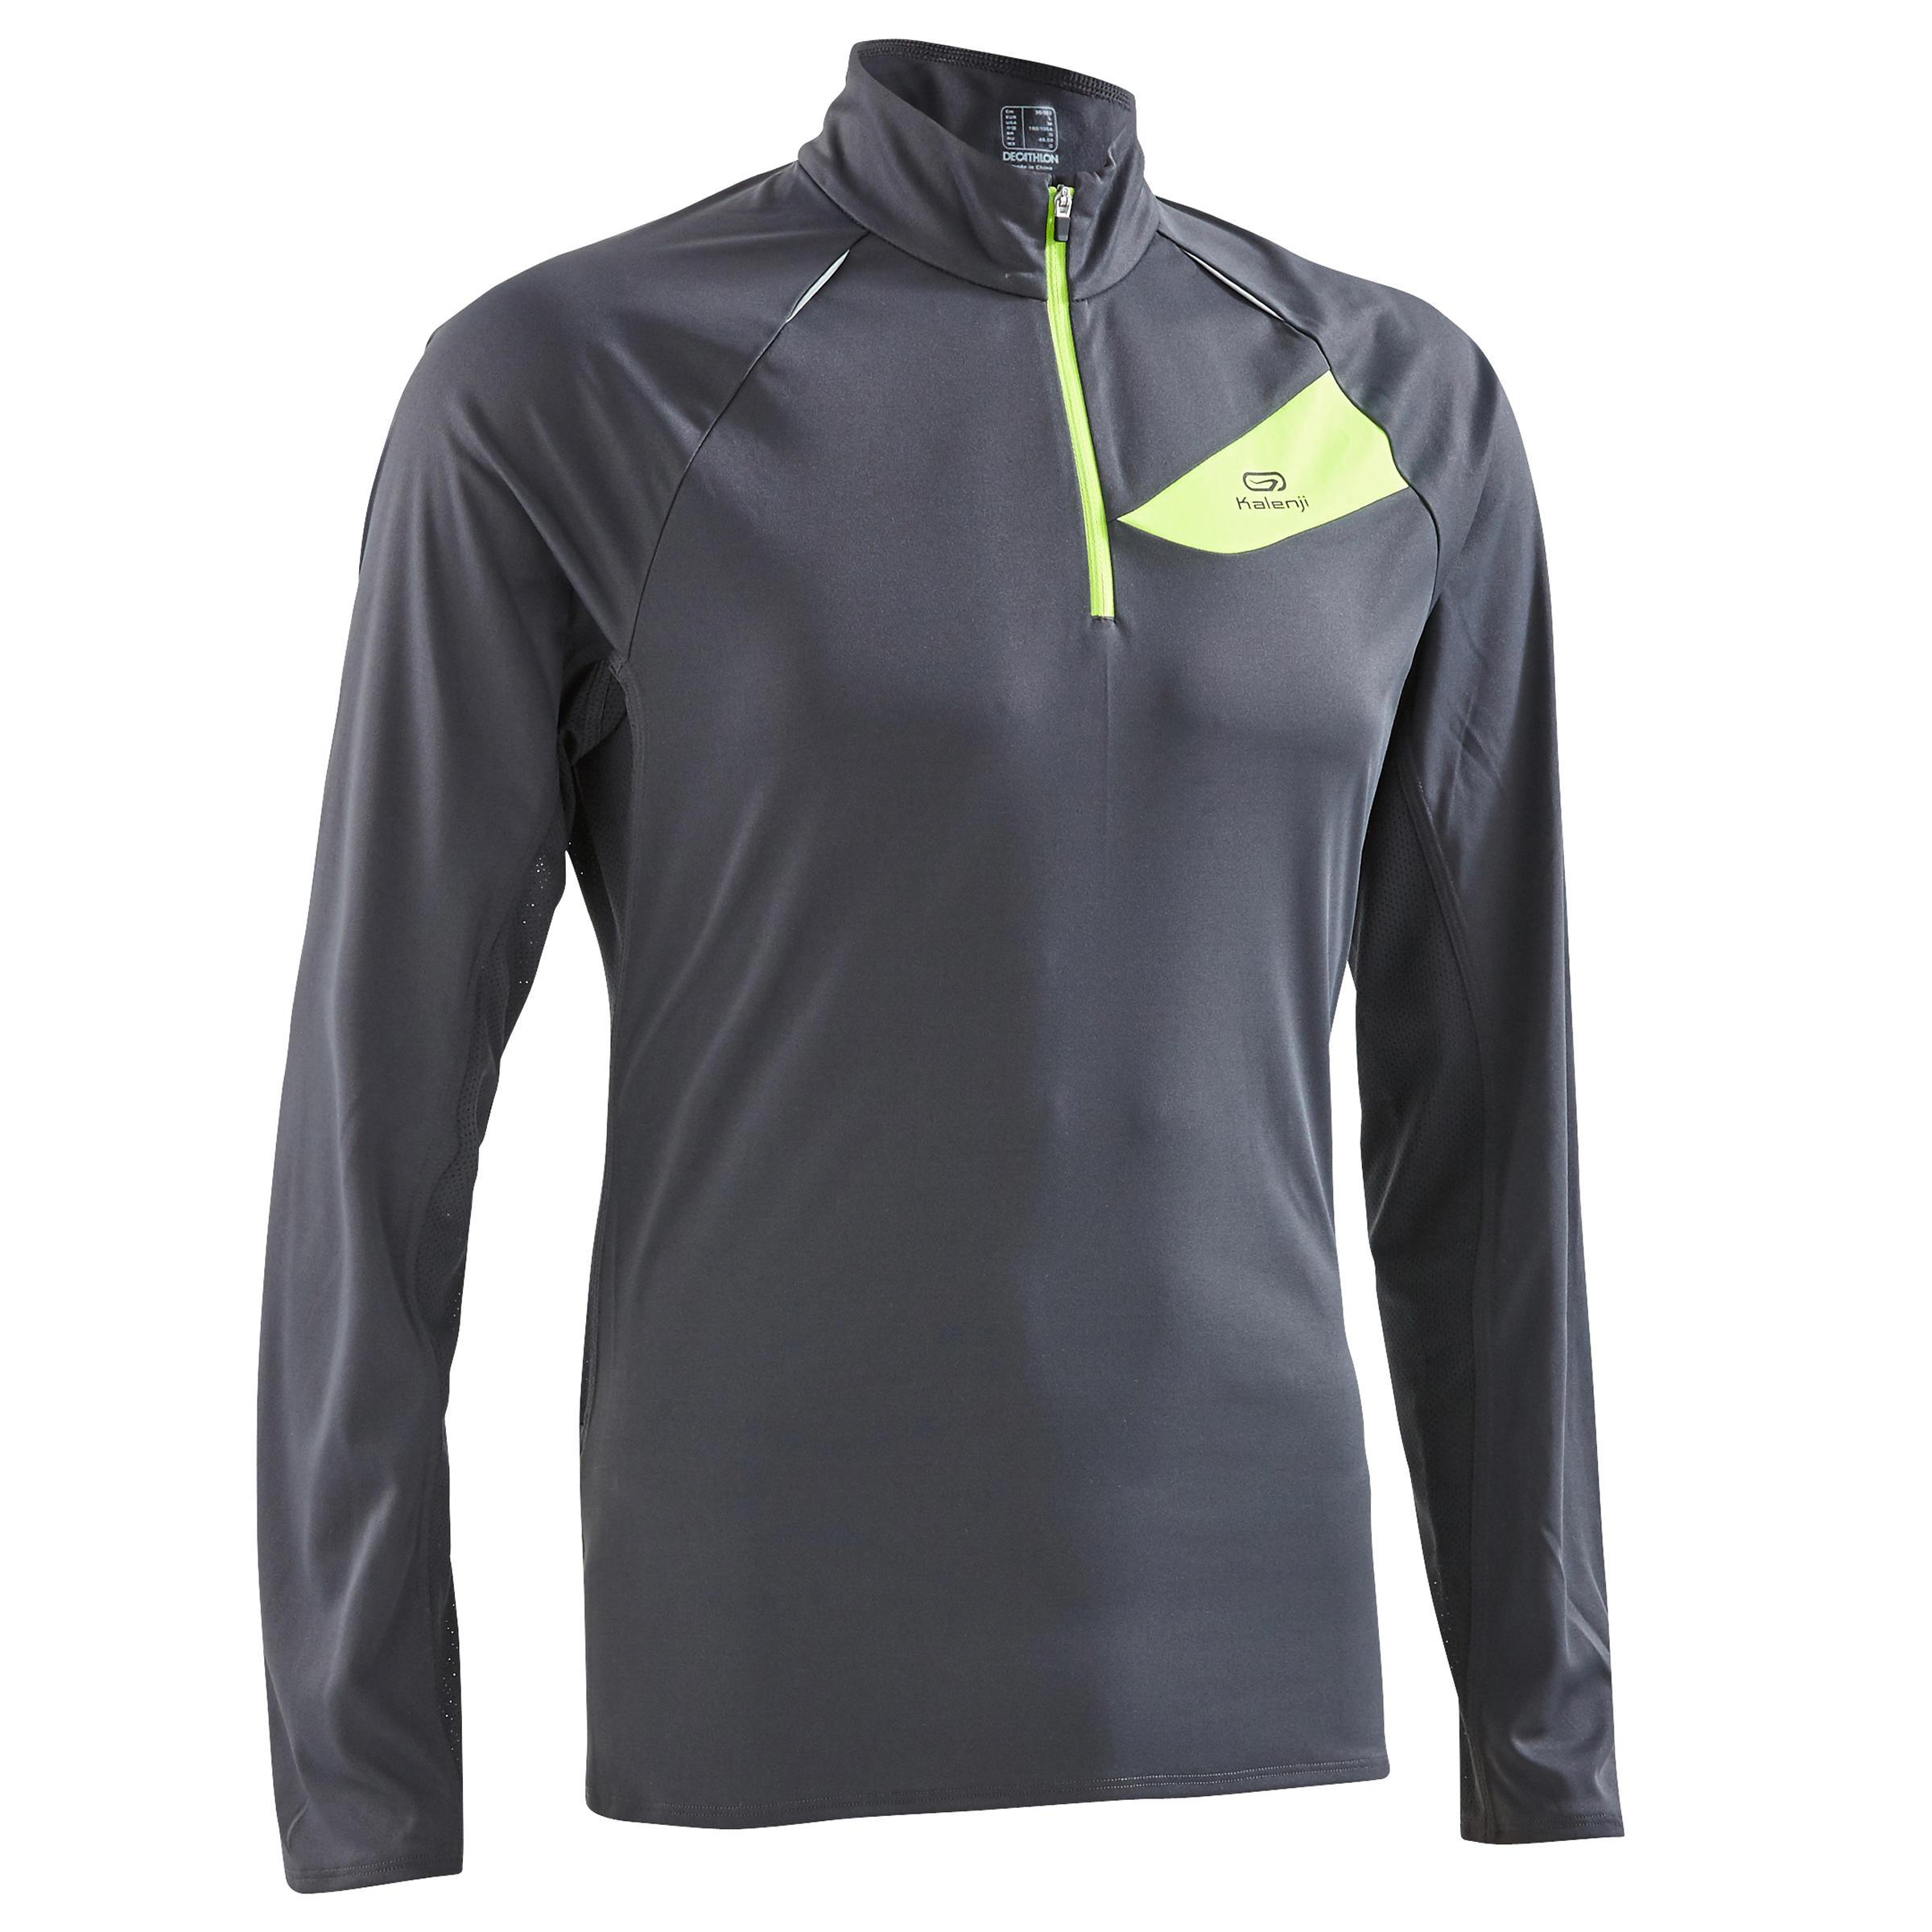 Men's Trail Running Long-Sleeved T-Shirt - Dark Grey Yellow